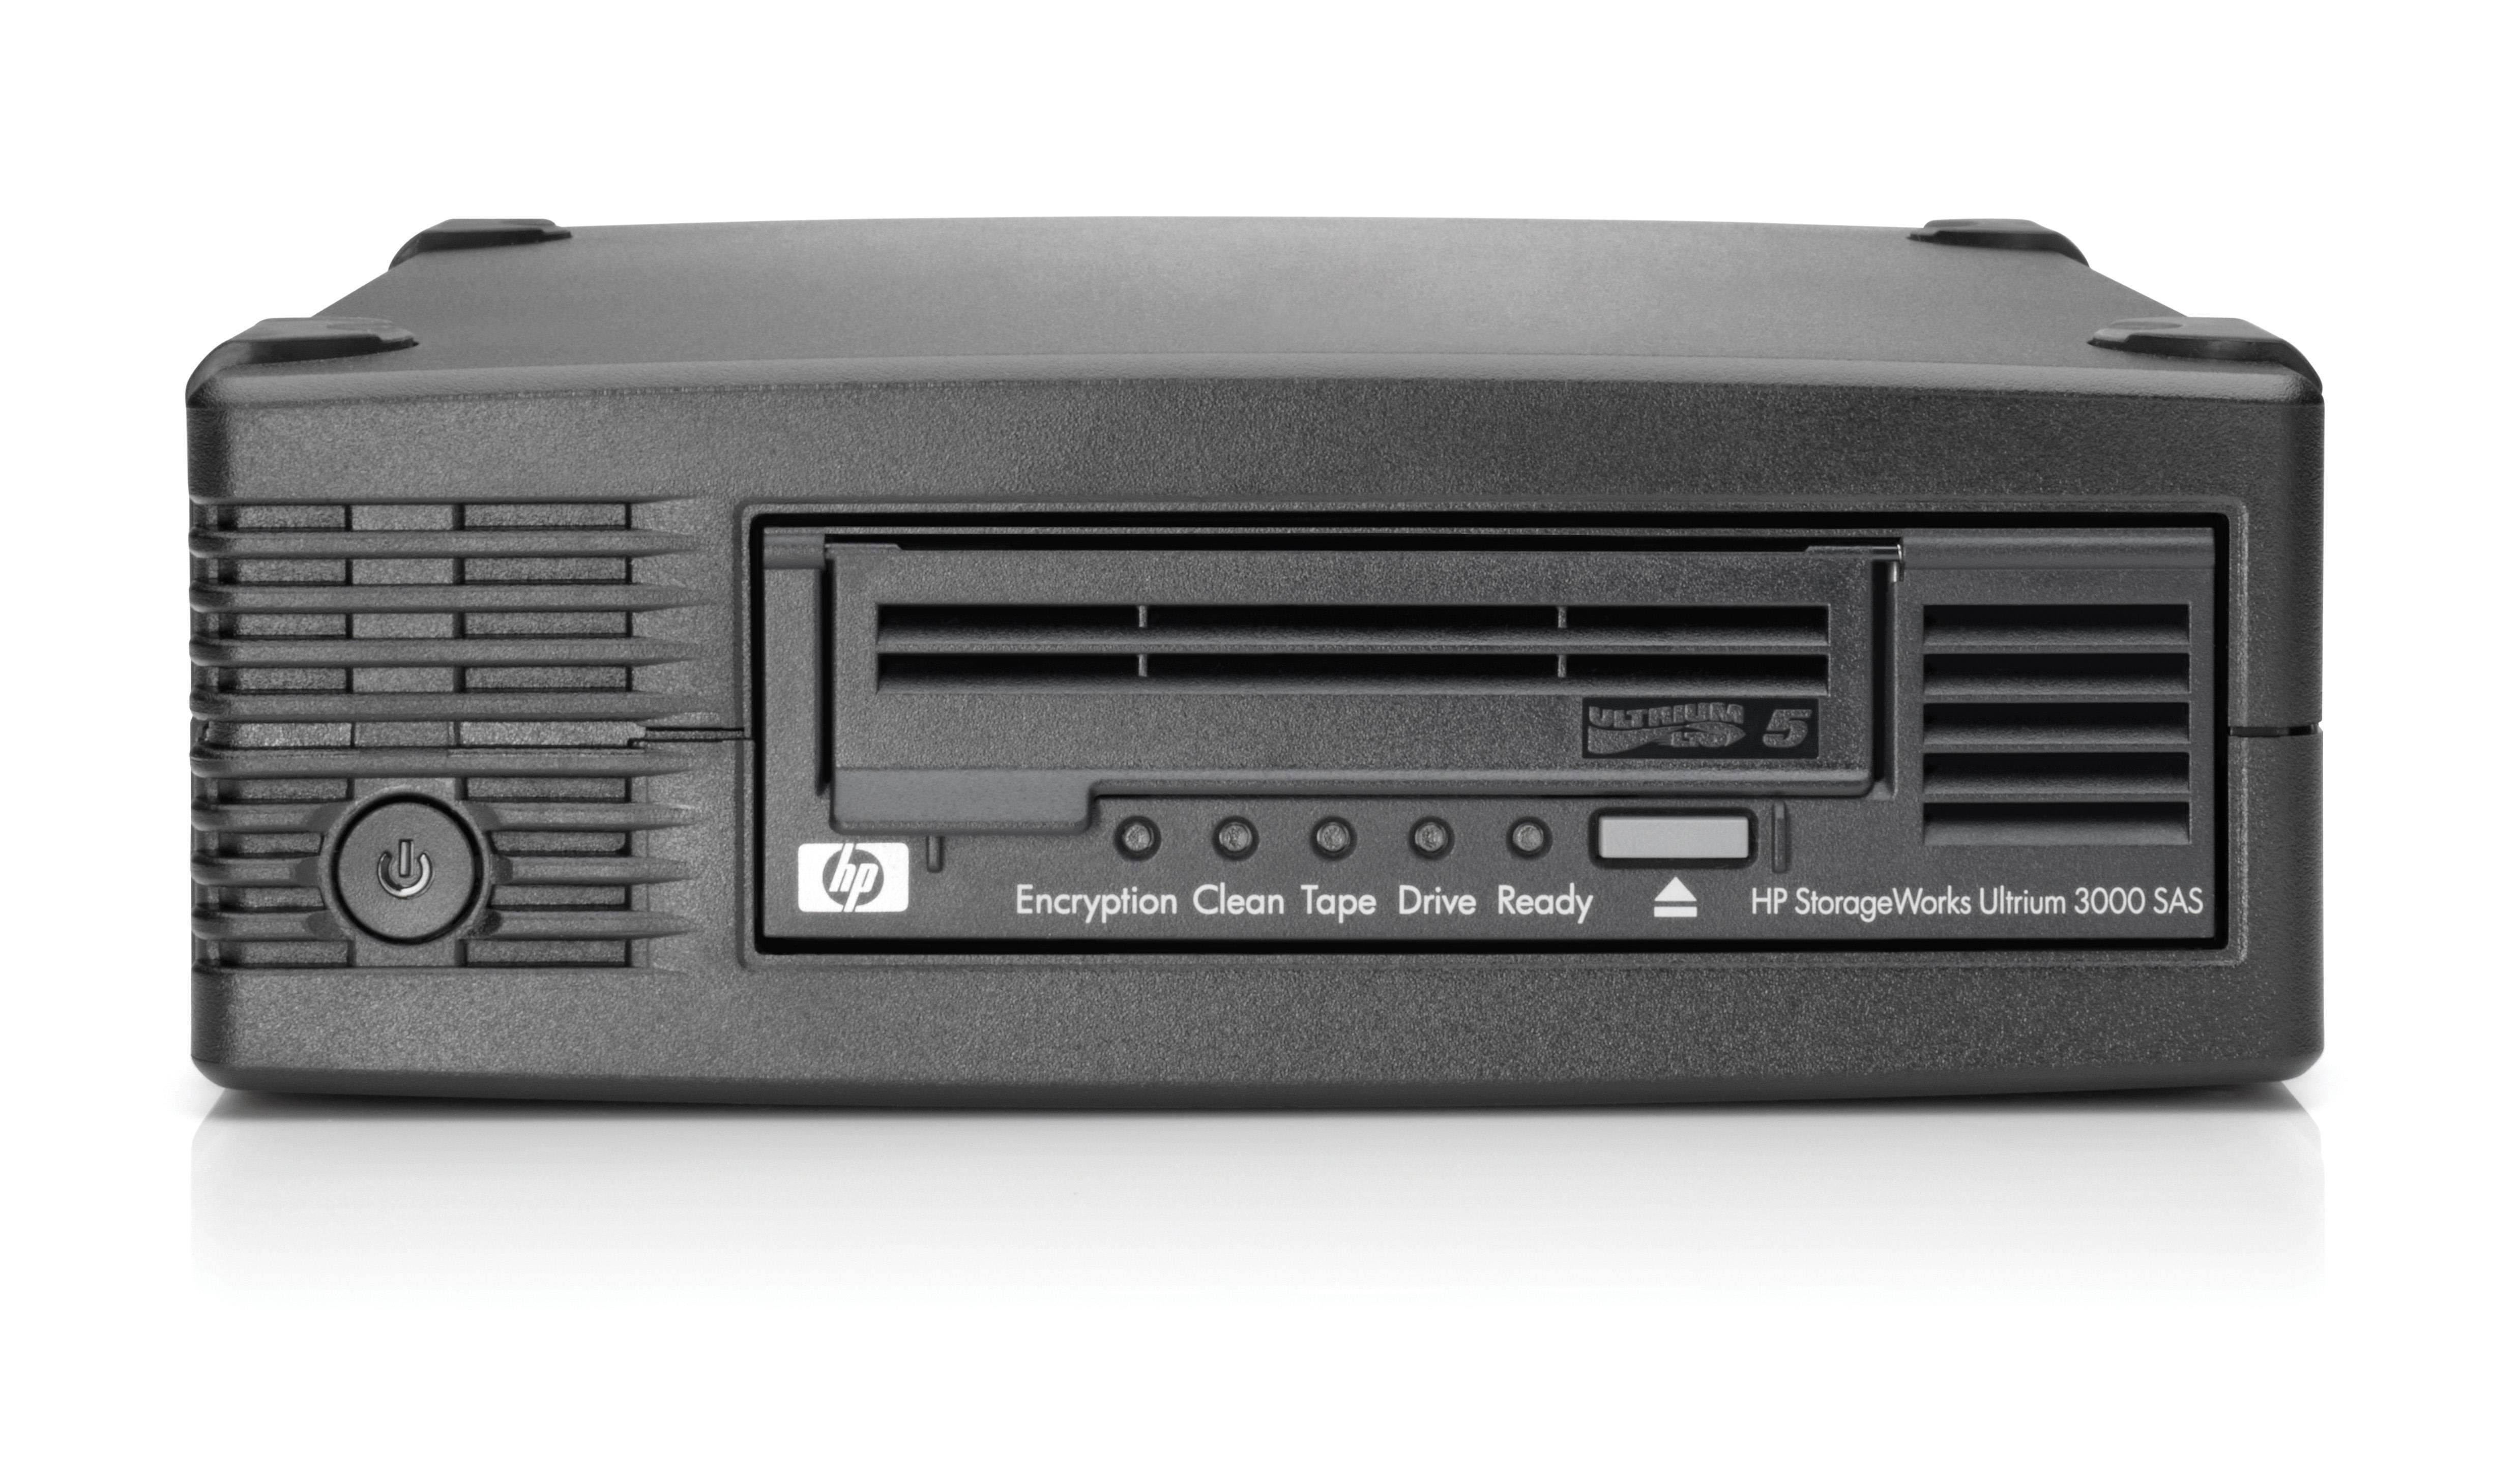 HP StoreEver LTO-5 Ultrium 3000 SAS External Tape Drive with 5 LTO-5 Media/TVlite